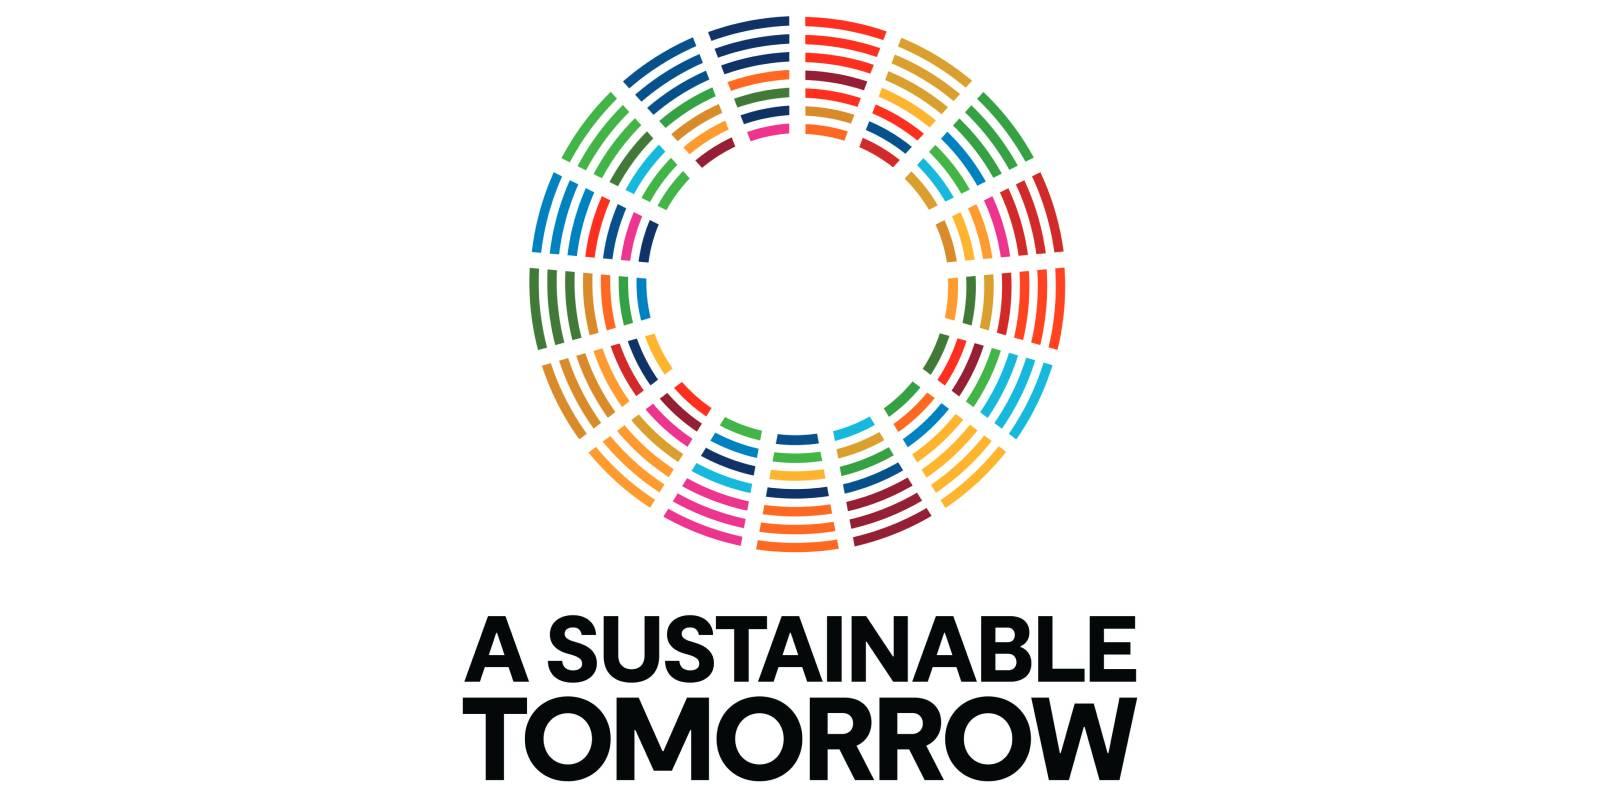 A Sustainable Tomorrow - HUB den 16e september